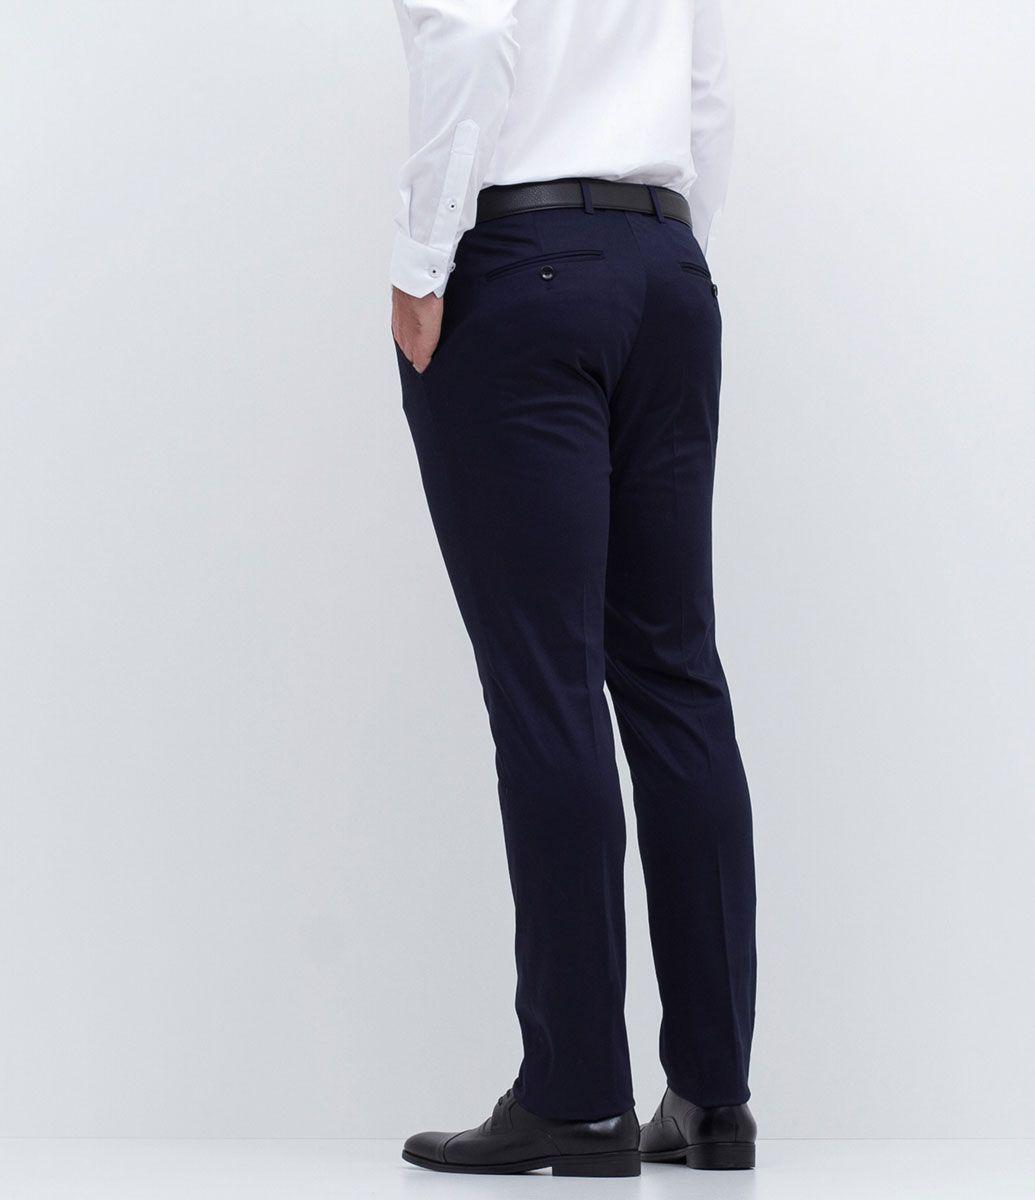 f4f3618369c Calça masculina Social Modelo slim Marca  Preston Field Tecido  Poliéster  Modelo veste tamanho